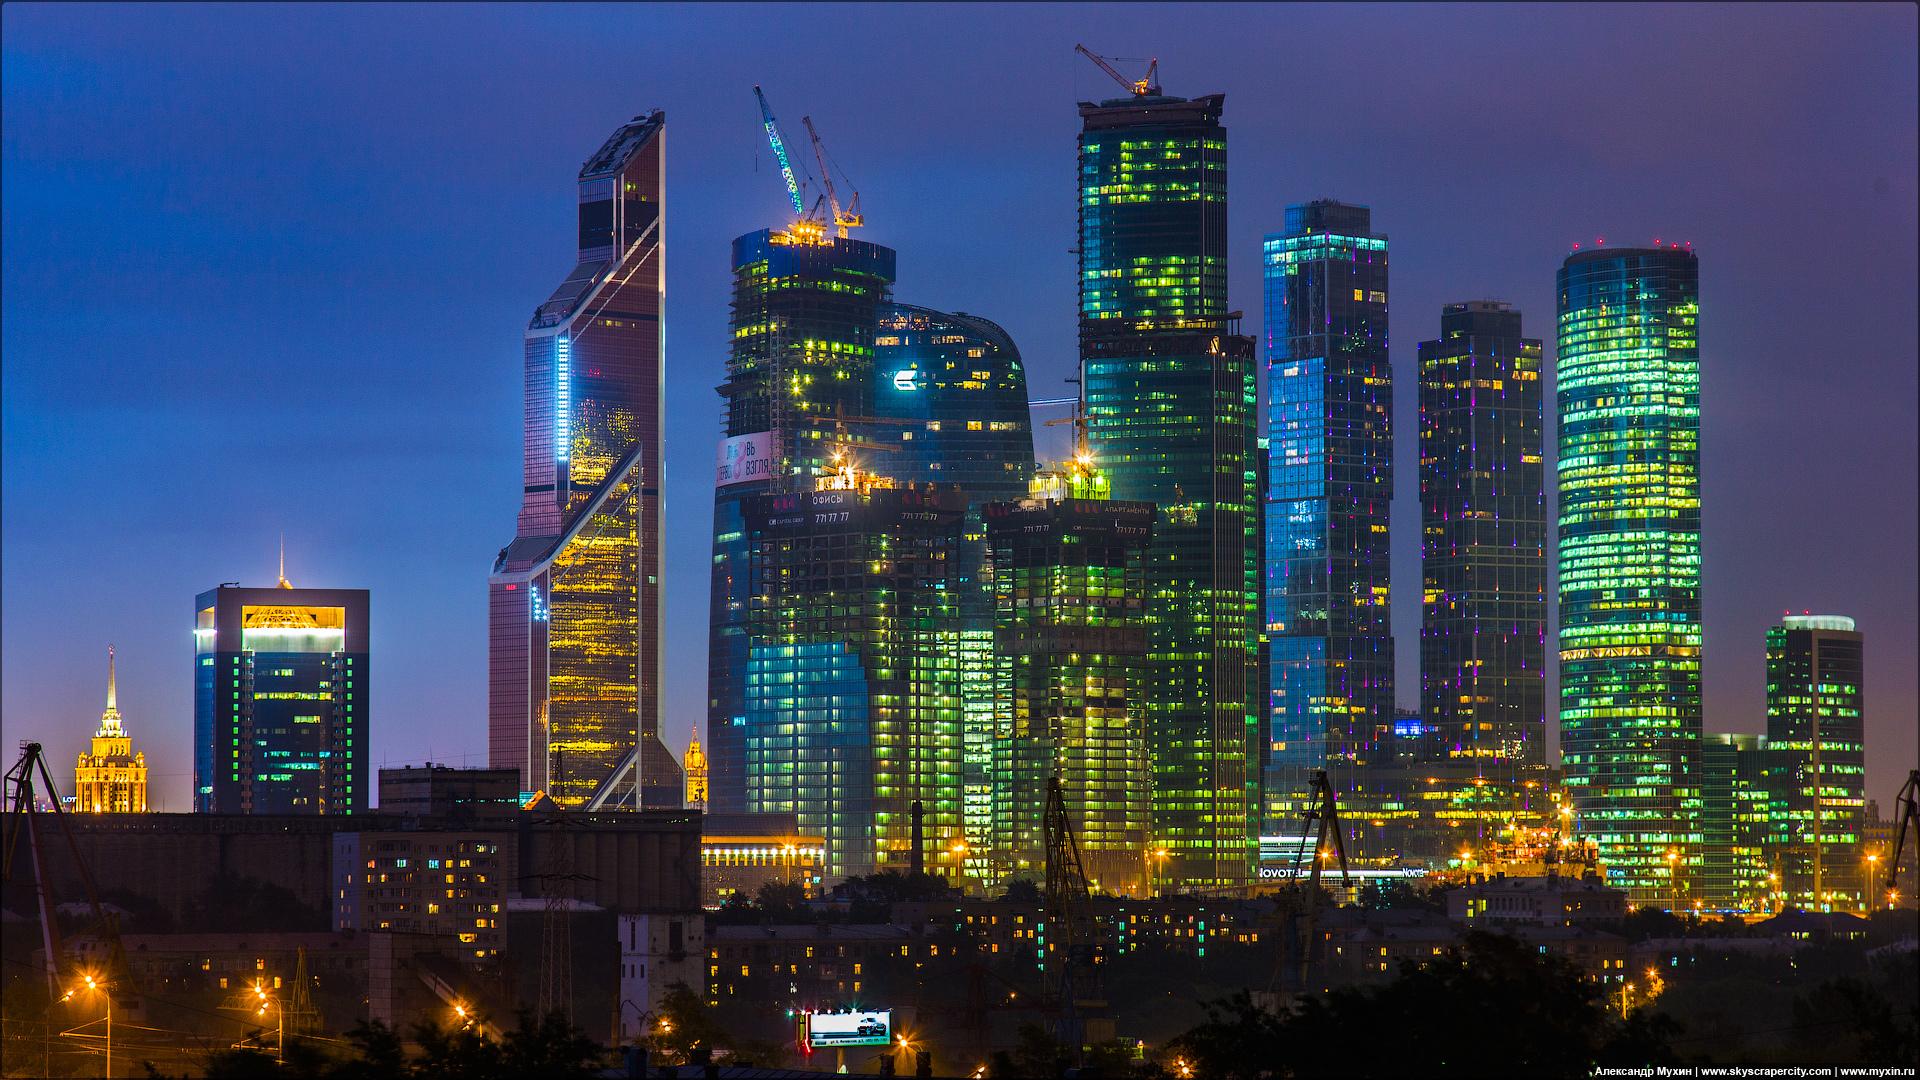 Moscow Skyline 1080p | Wide Screen Wallpaper 1080p,2K,4K